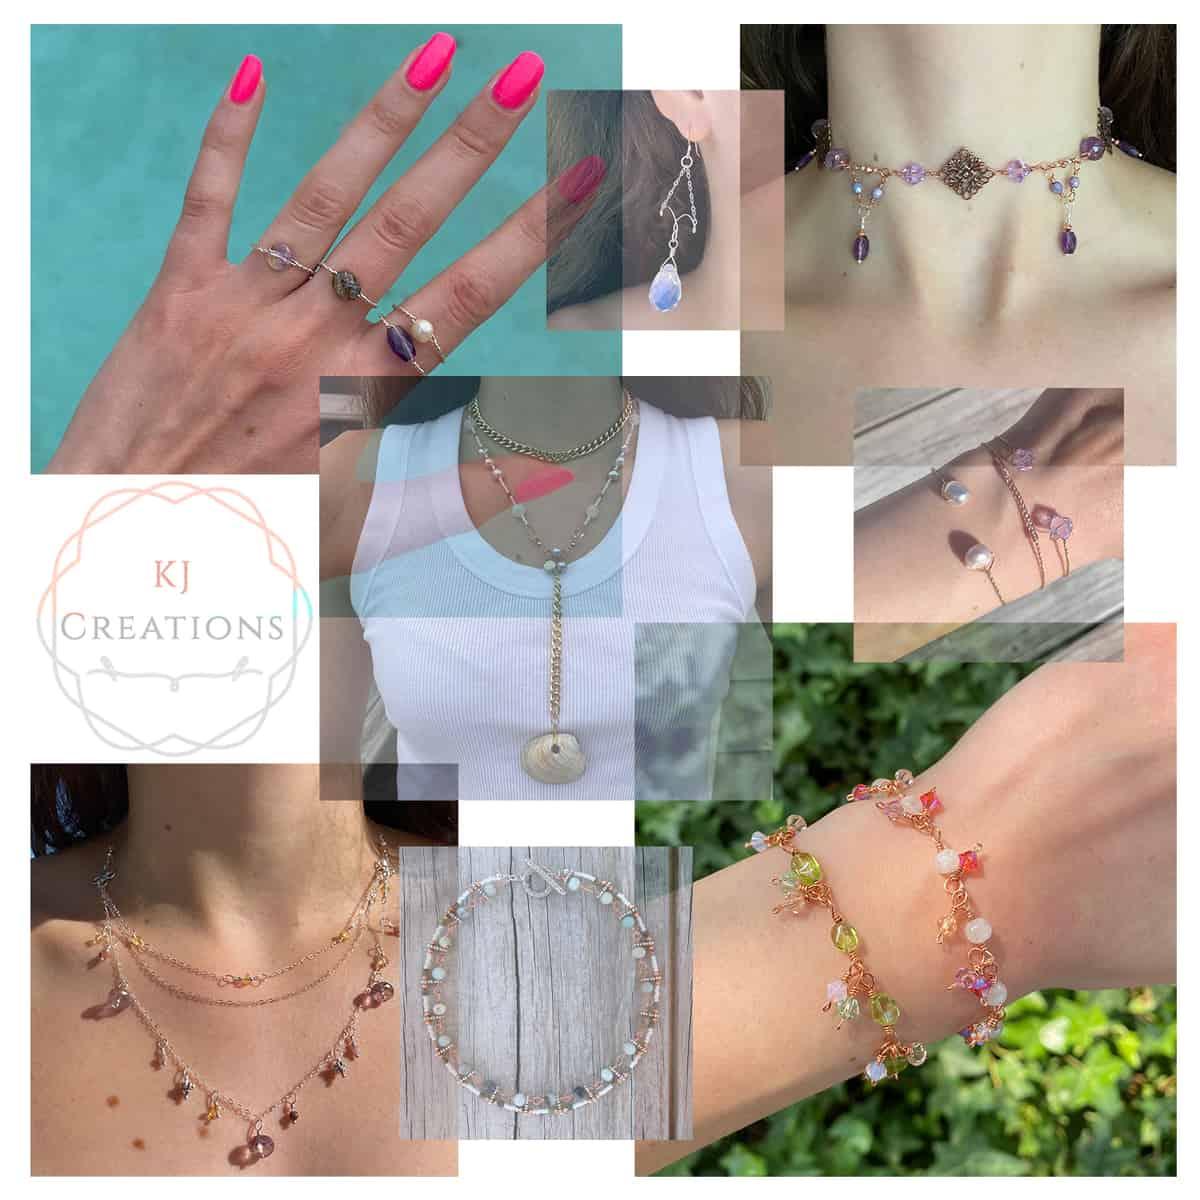 KJ Creations Jewelry